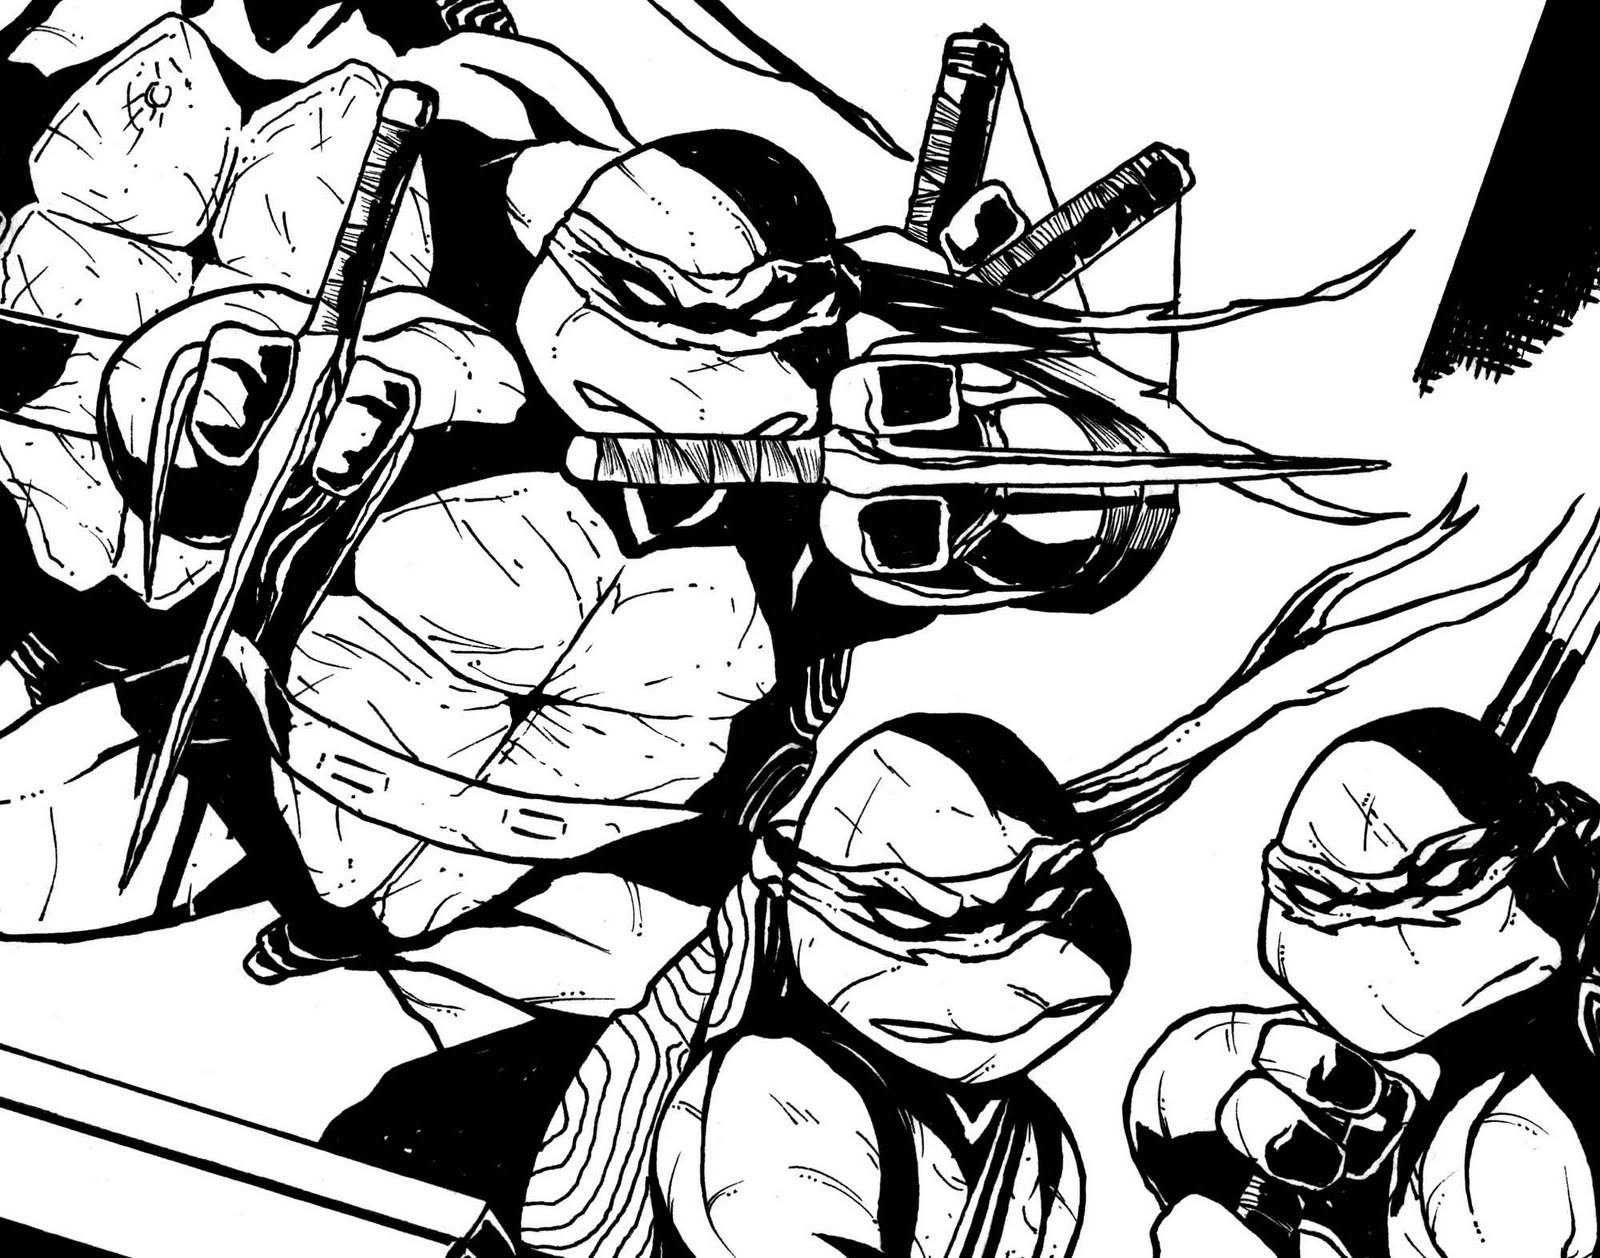 ninja turtles pictures the art of jason flowers teenage mutant ninja turtles pictures turtles ninja